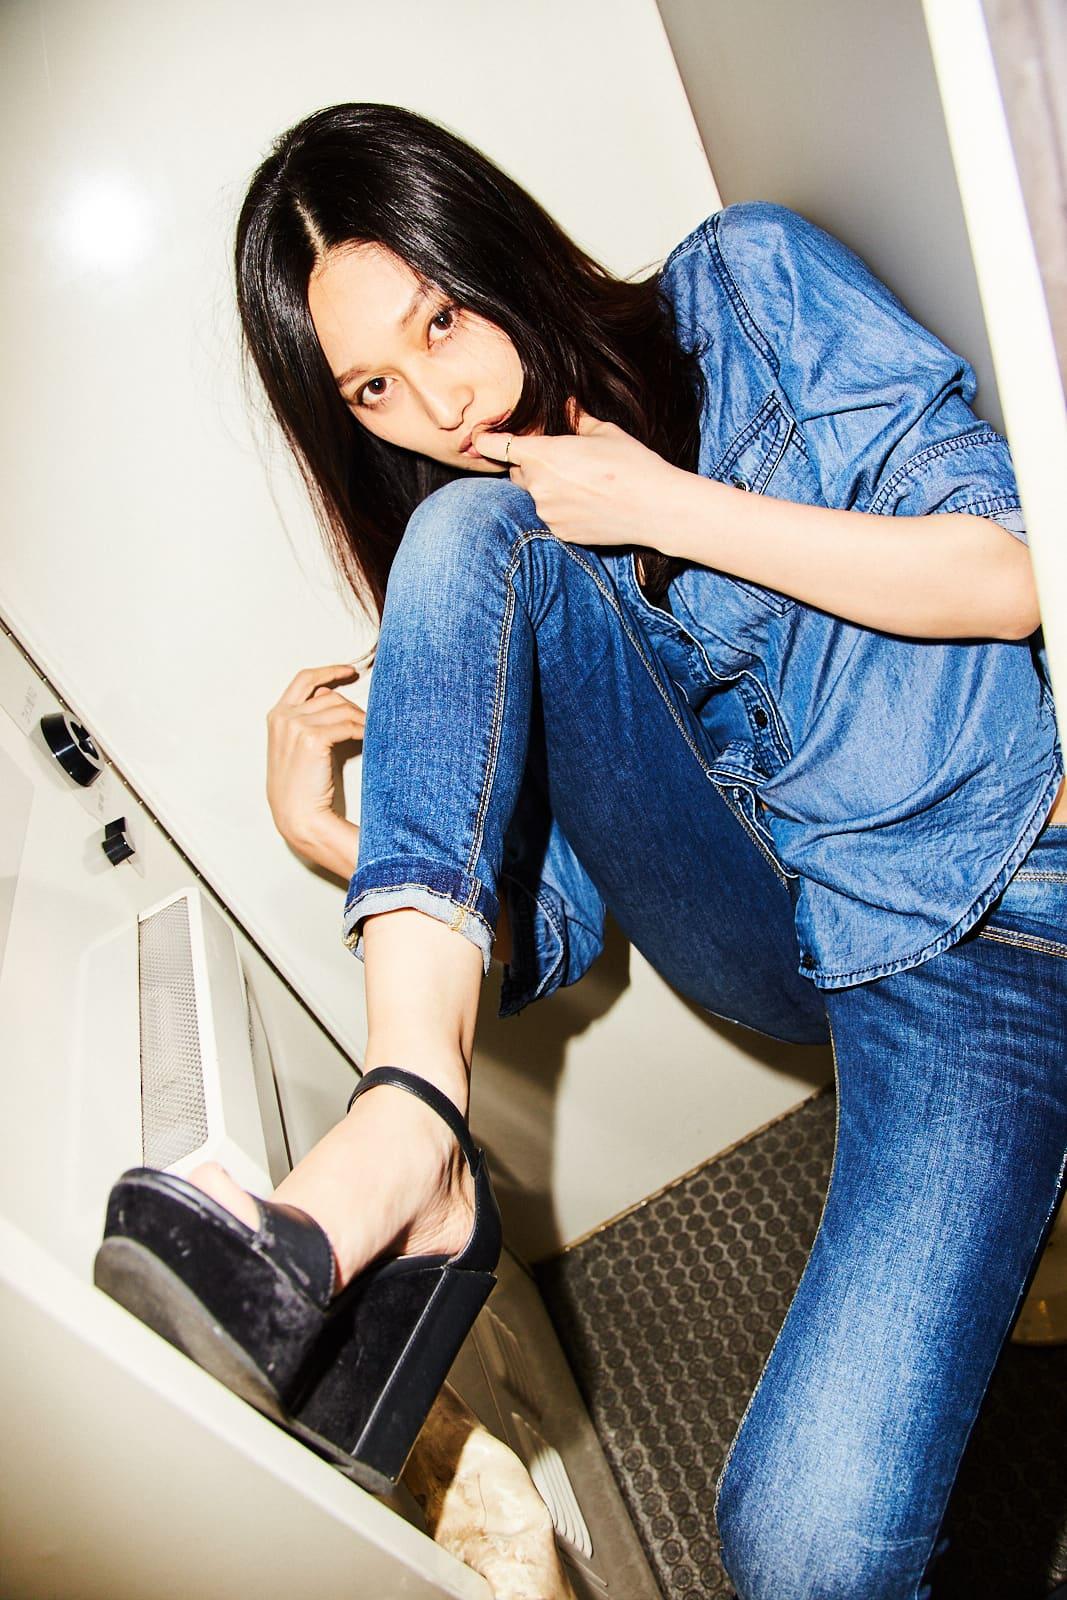 Nori Sato - Nextdoormodel Magazine